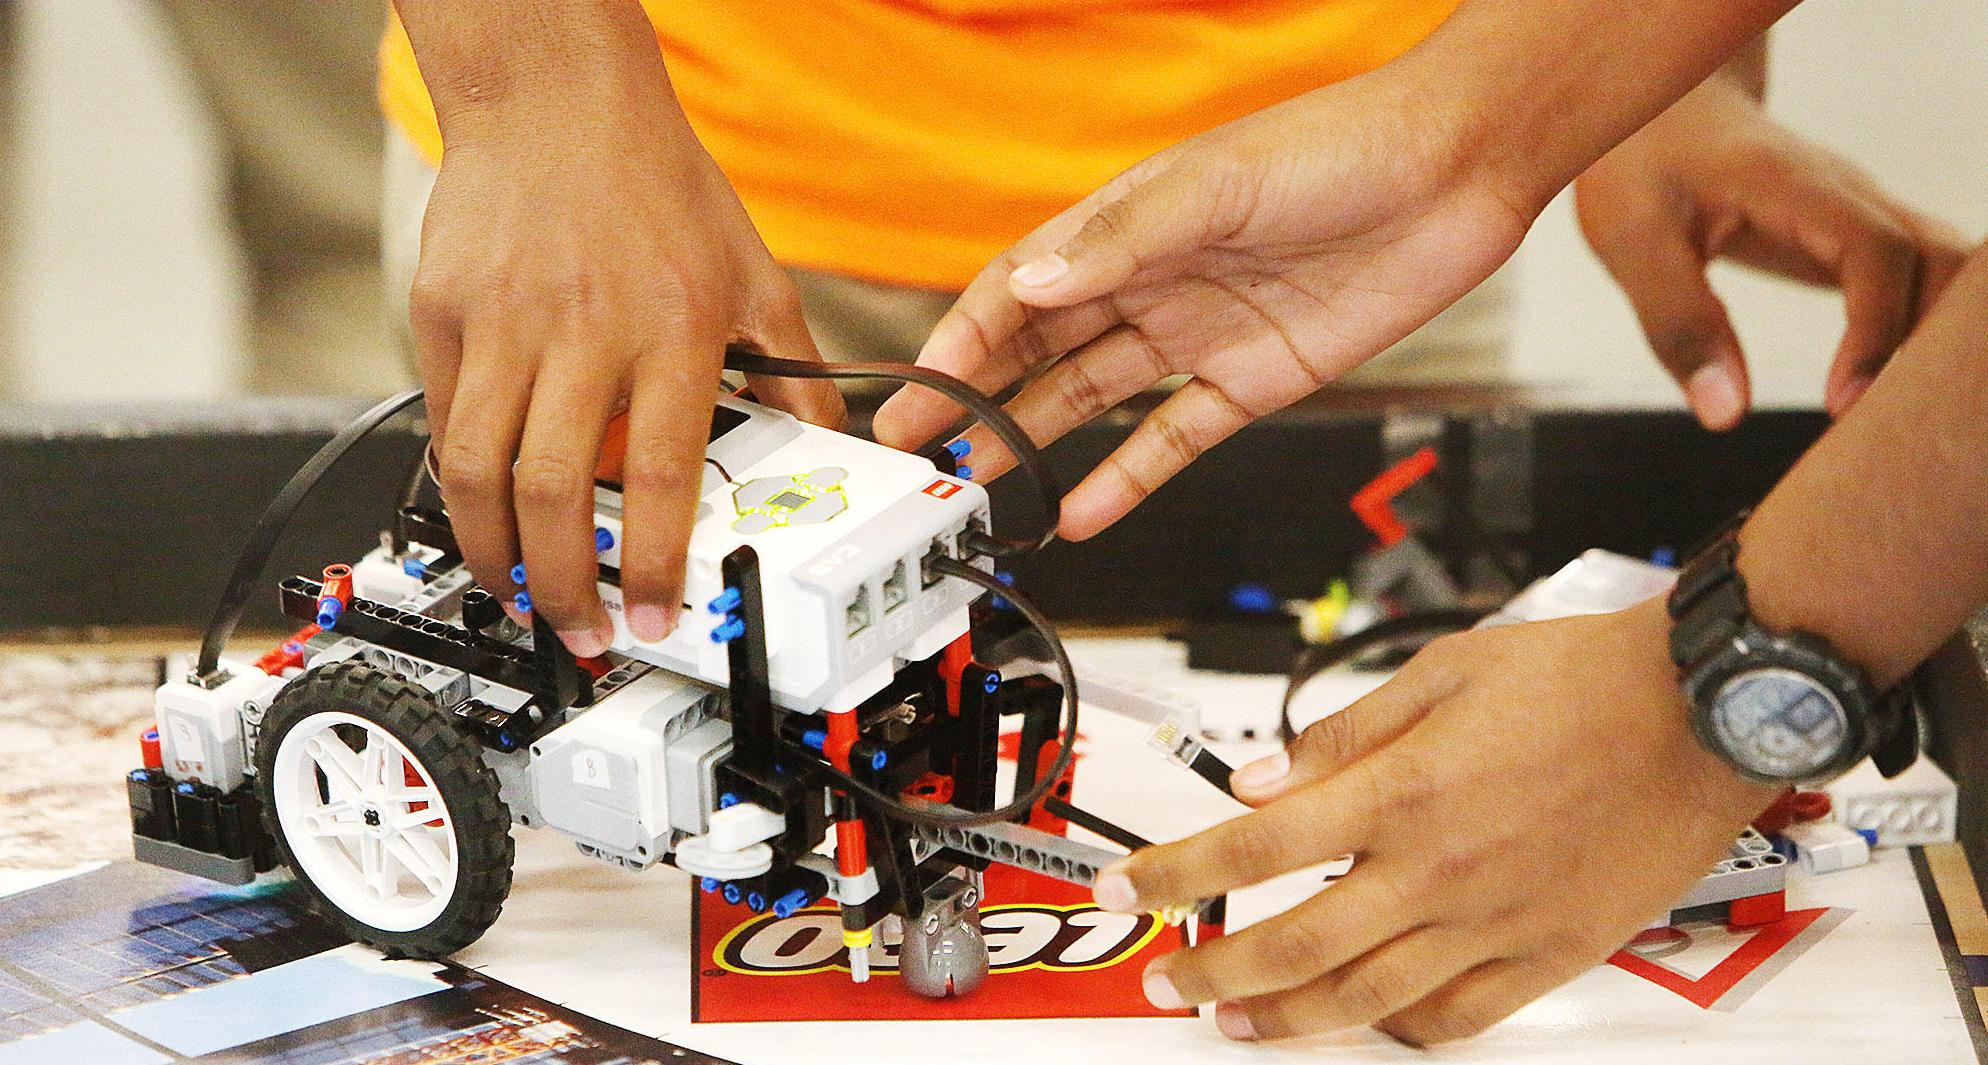 Learn to Build & Program Robots using LEGO Mi